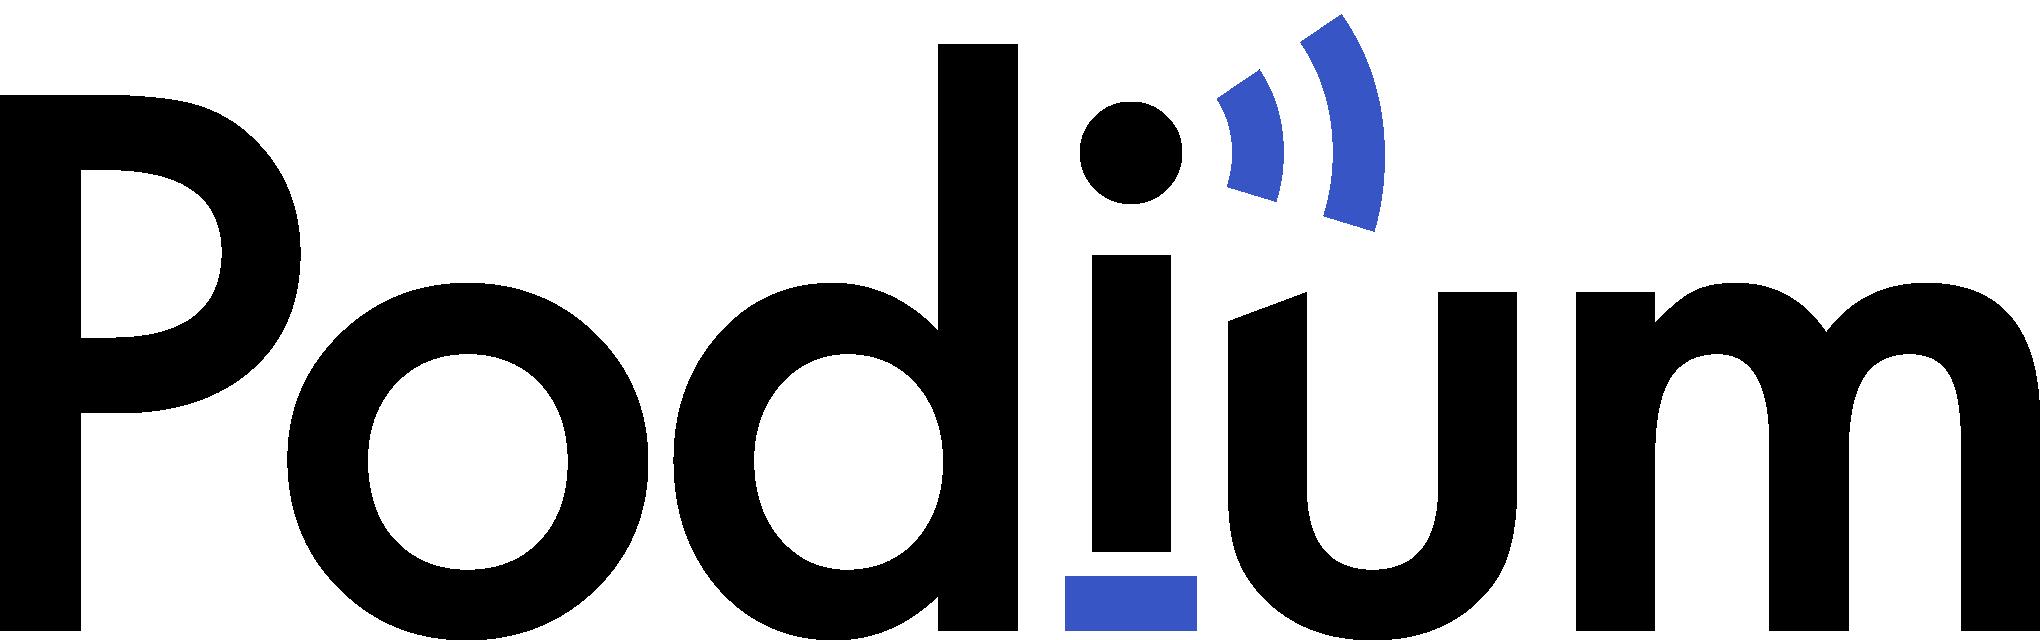 Logos . Podium clipart pulpit